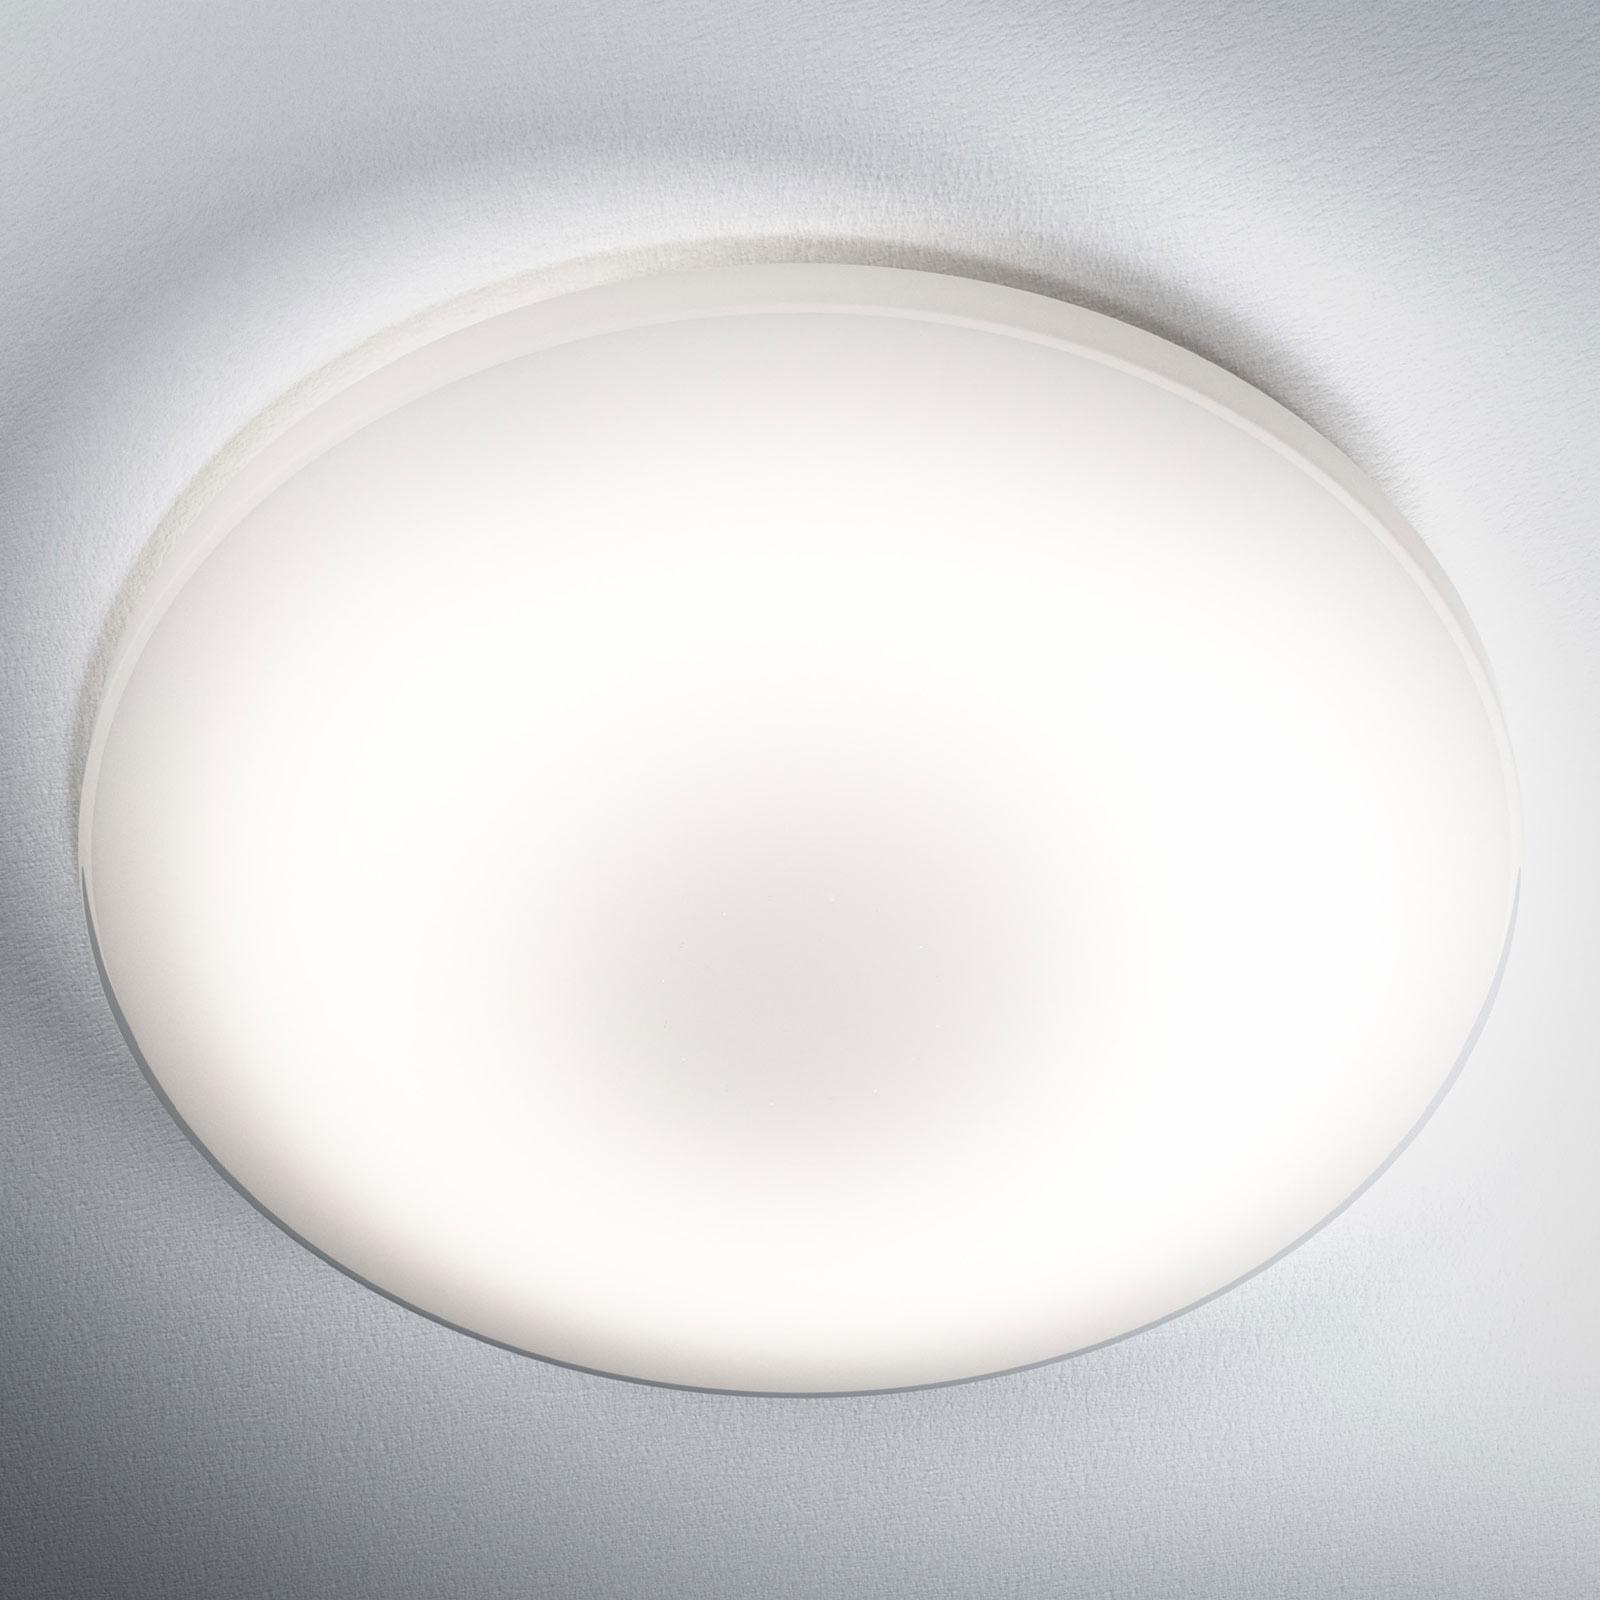 LEDVANCE Orbis Pure lampa sufitowa LED 40 cm 21 W